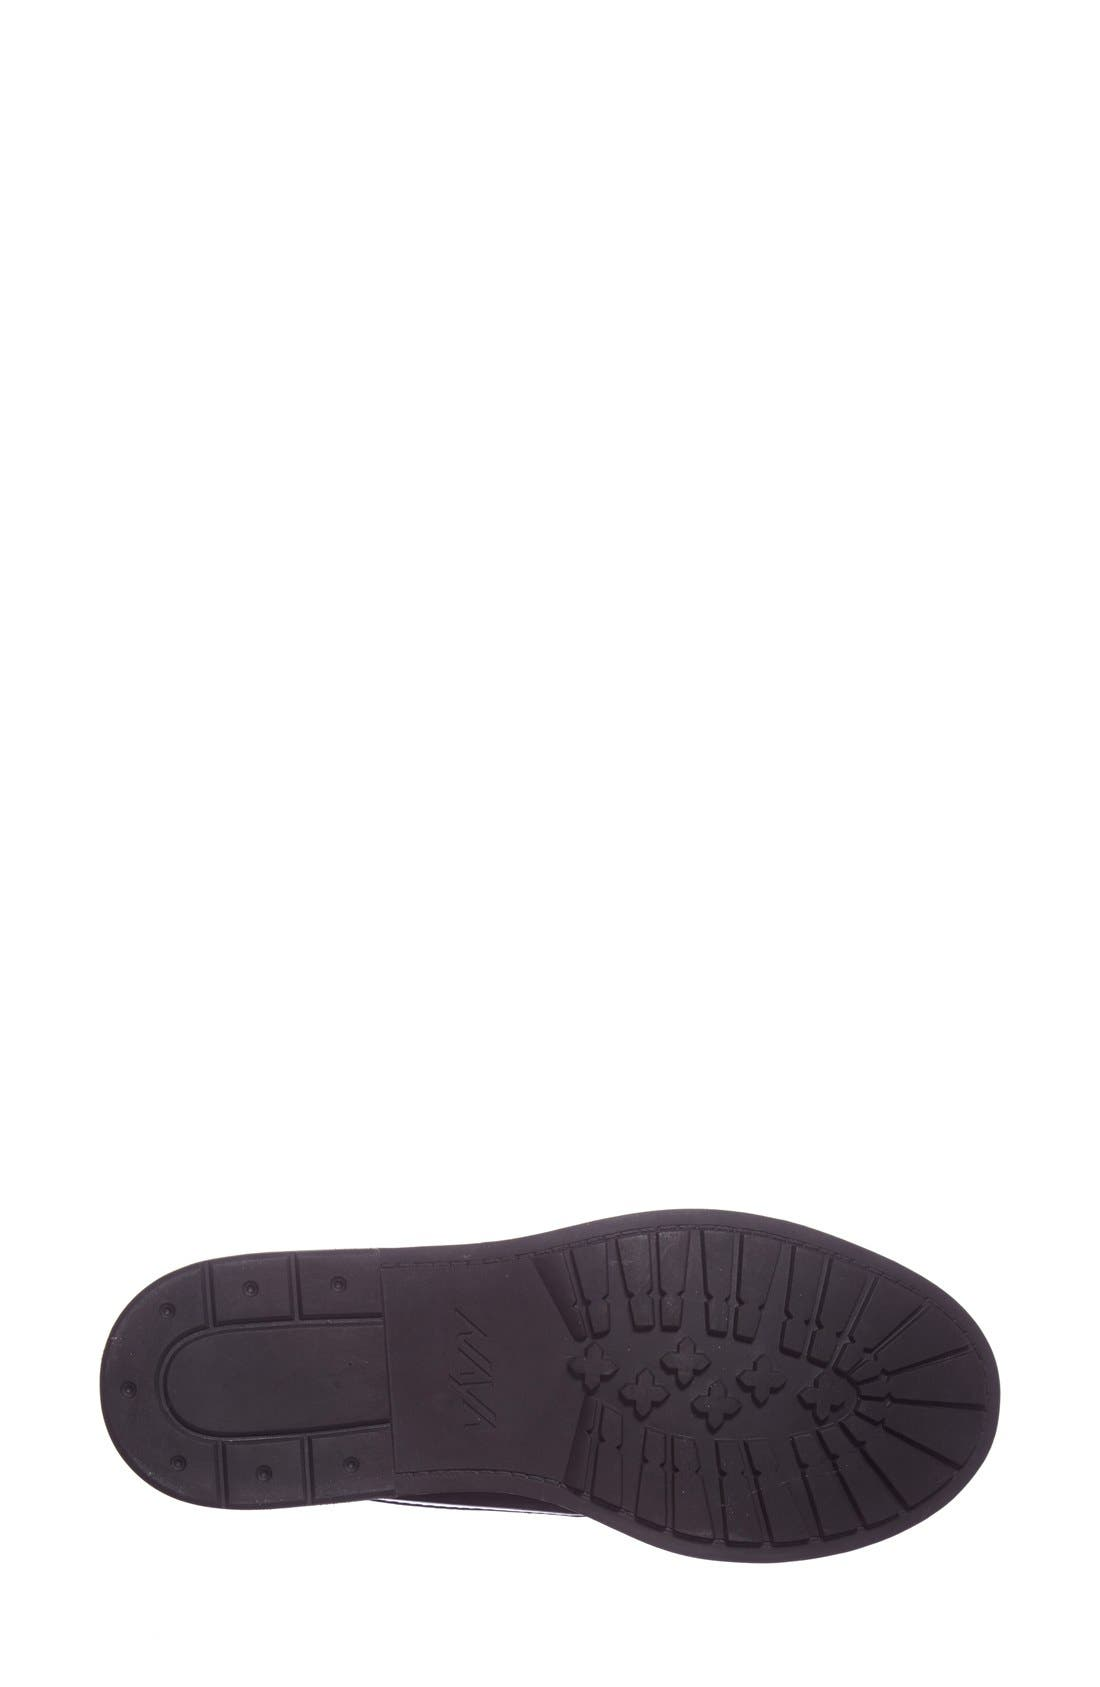 NAYA,                             'Renata' Hand Finished Leather Boot,                             Alternate thumbnail 4, color,                             001